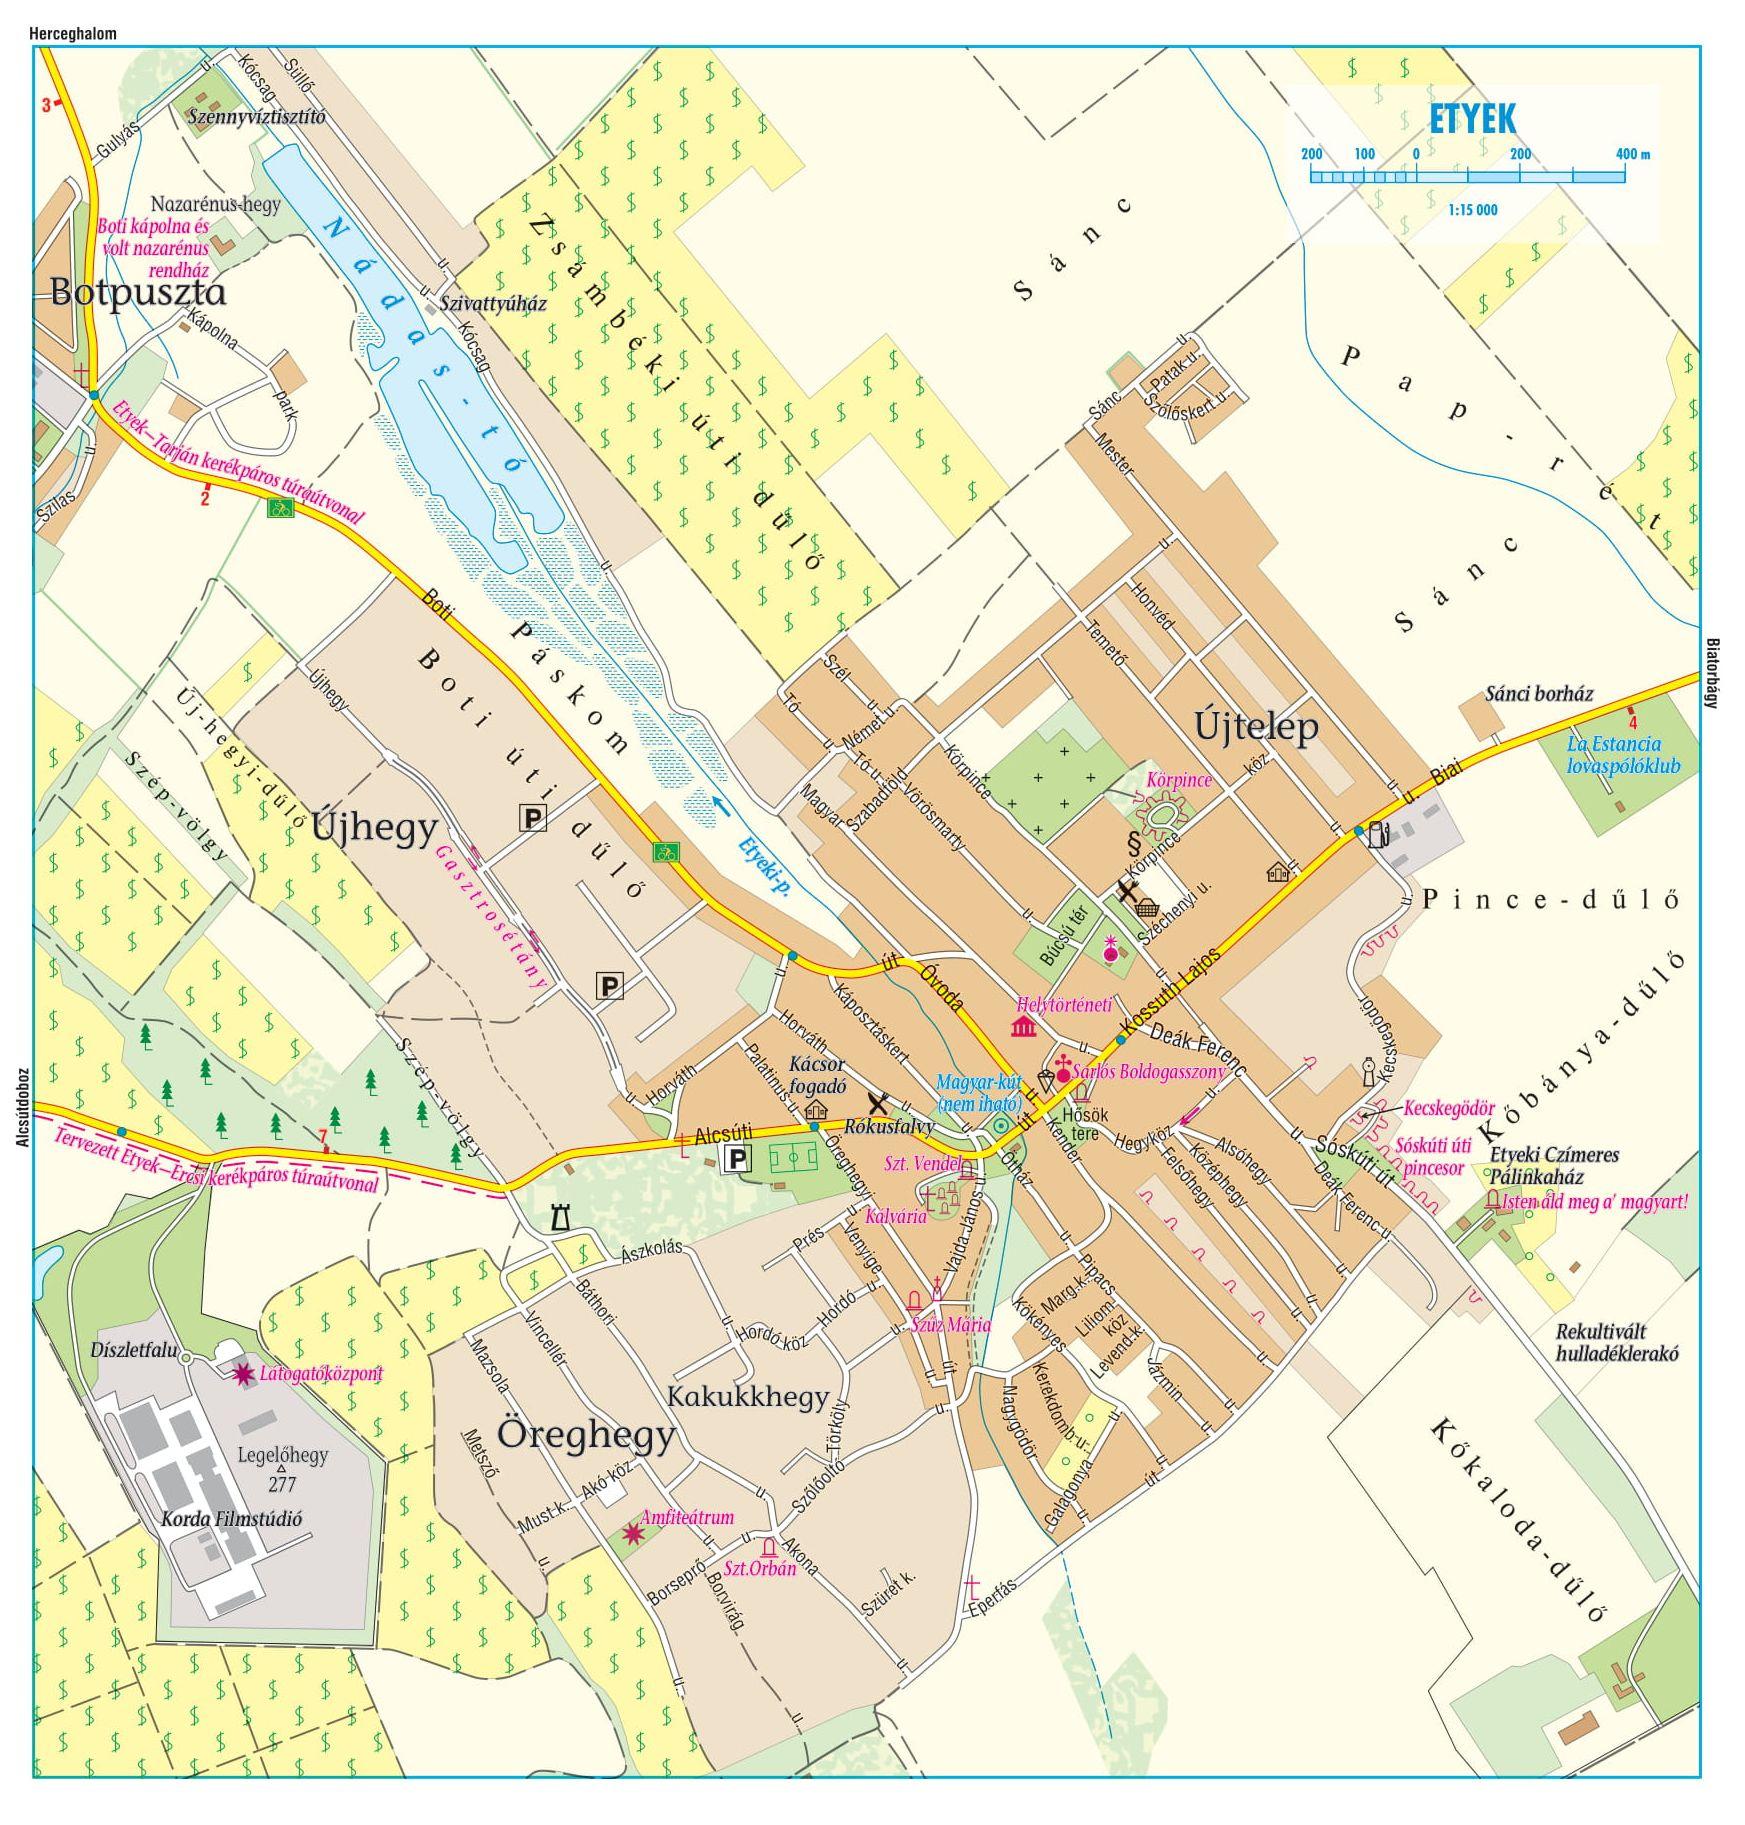 Zsámbéki-medence/Etyeki-dombság: Etyek 1:15.000